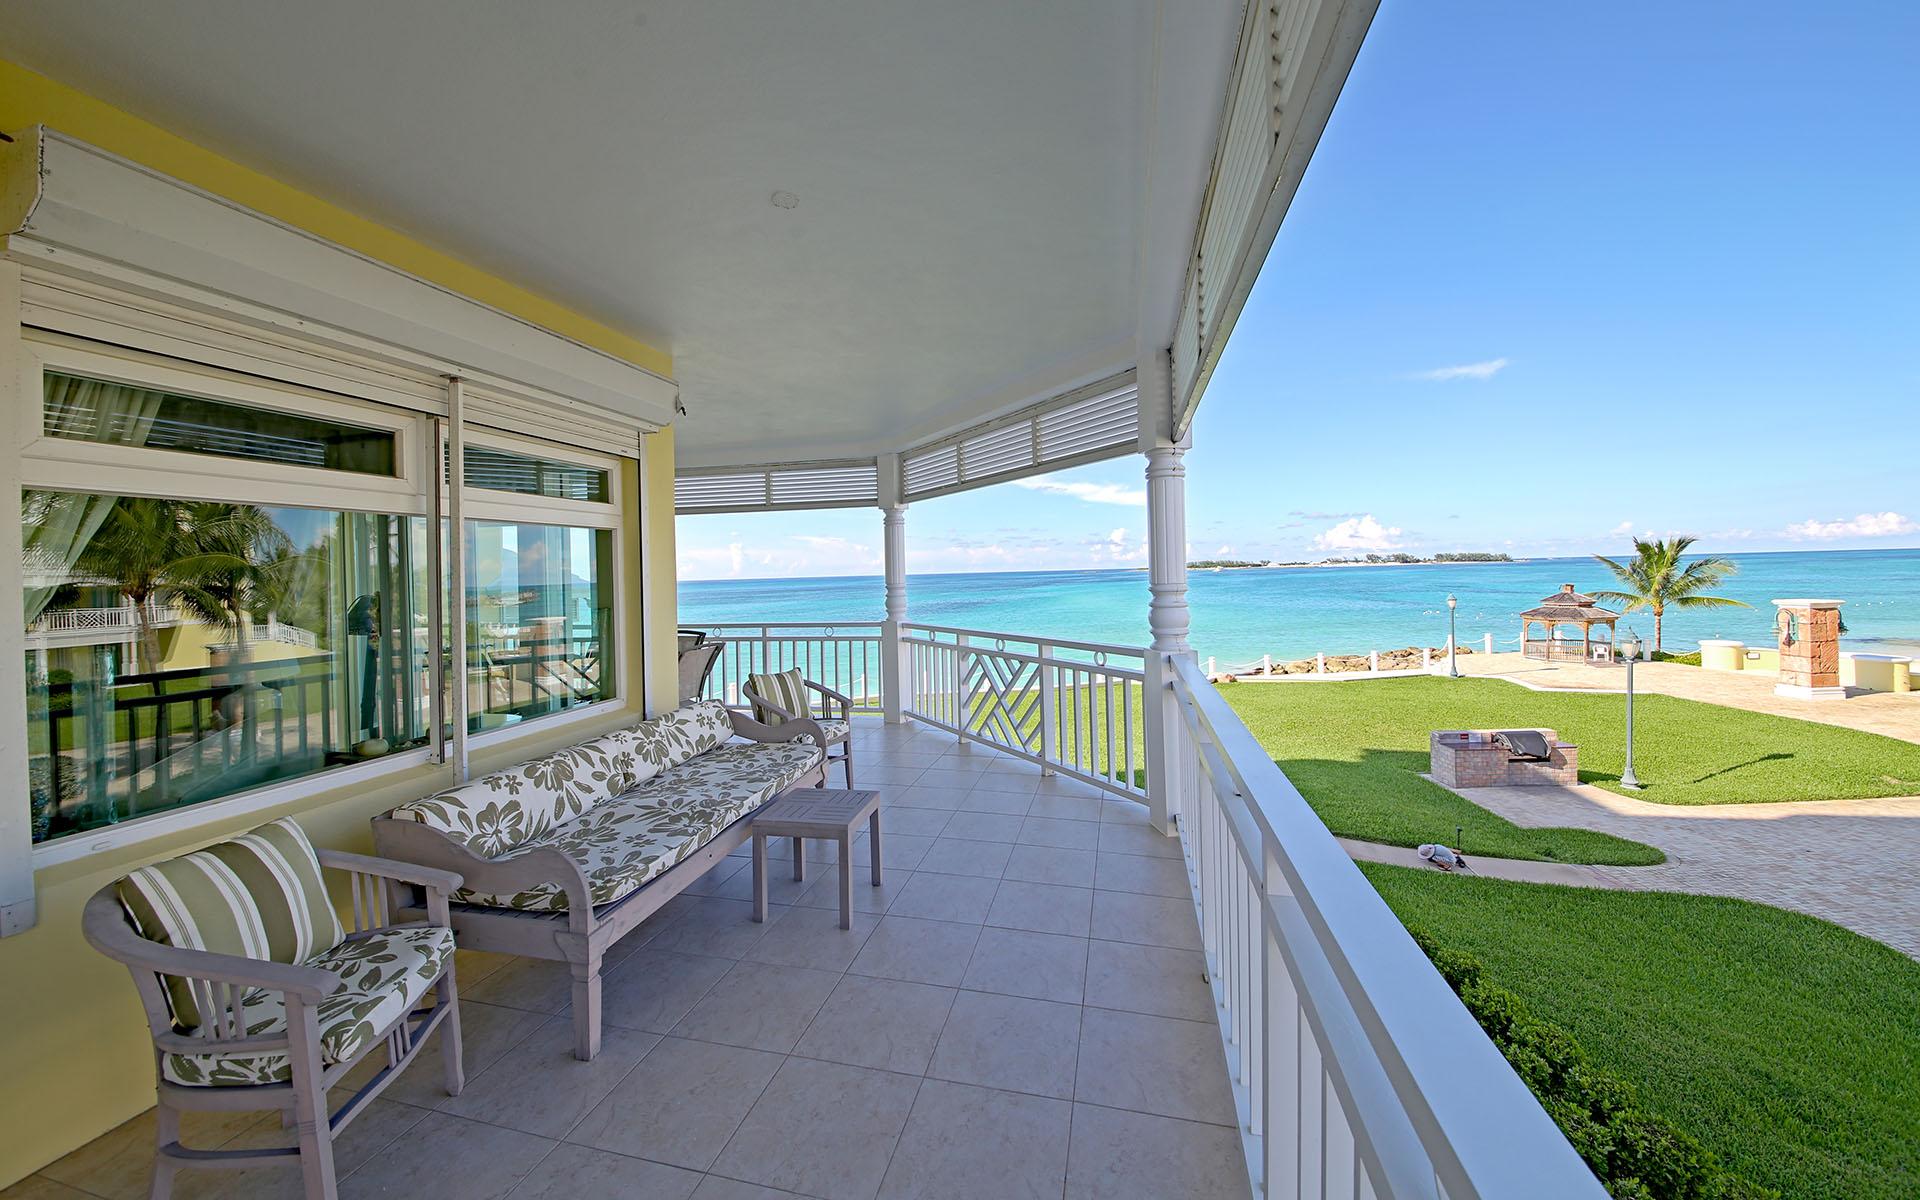 Co-op / Condo for Sale at Beachfront Living at Bayroc Bayroc, Cable Beach, Nassau And Paradise Island Bahamas